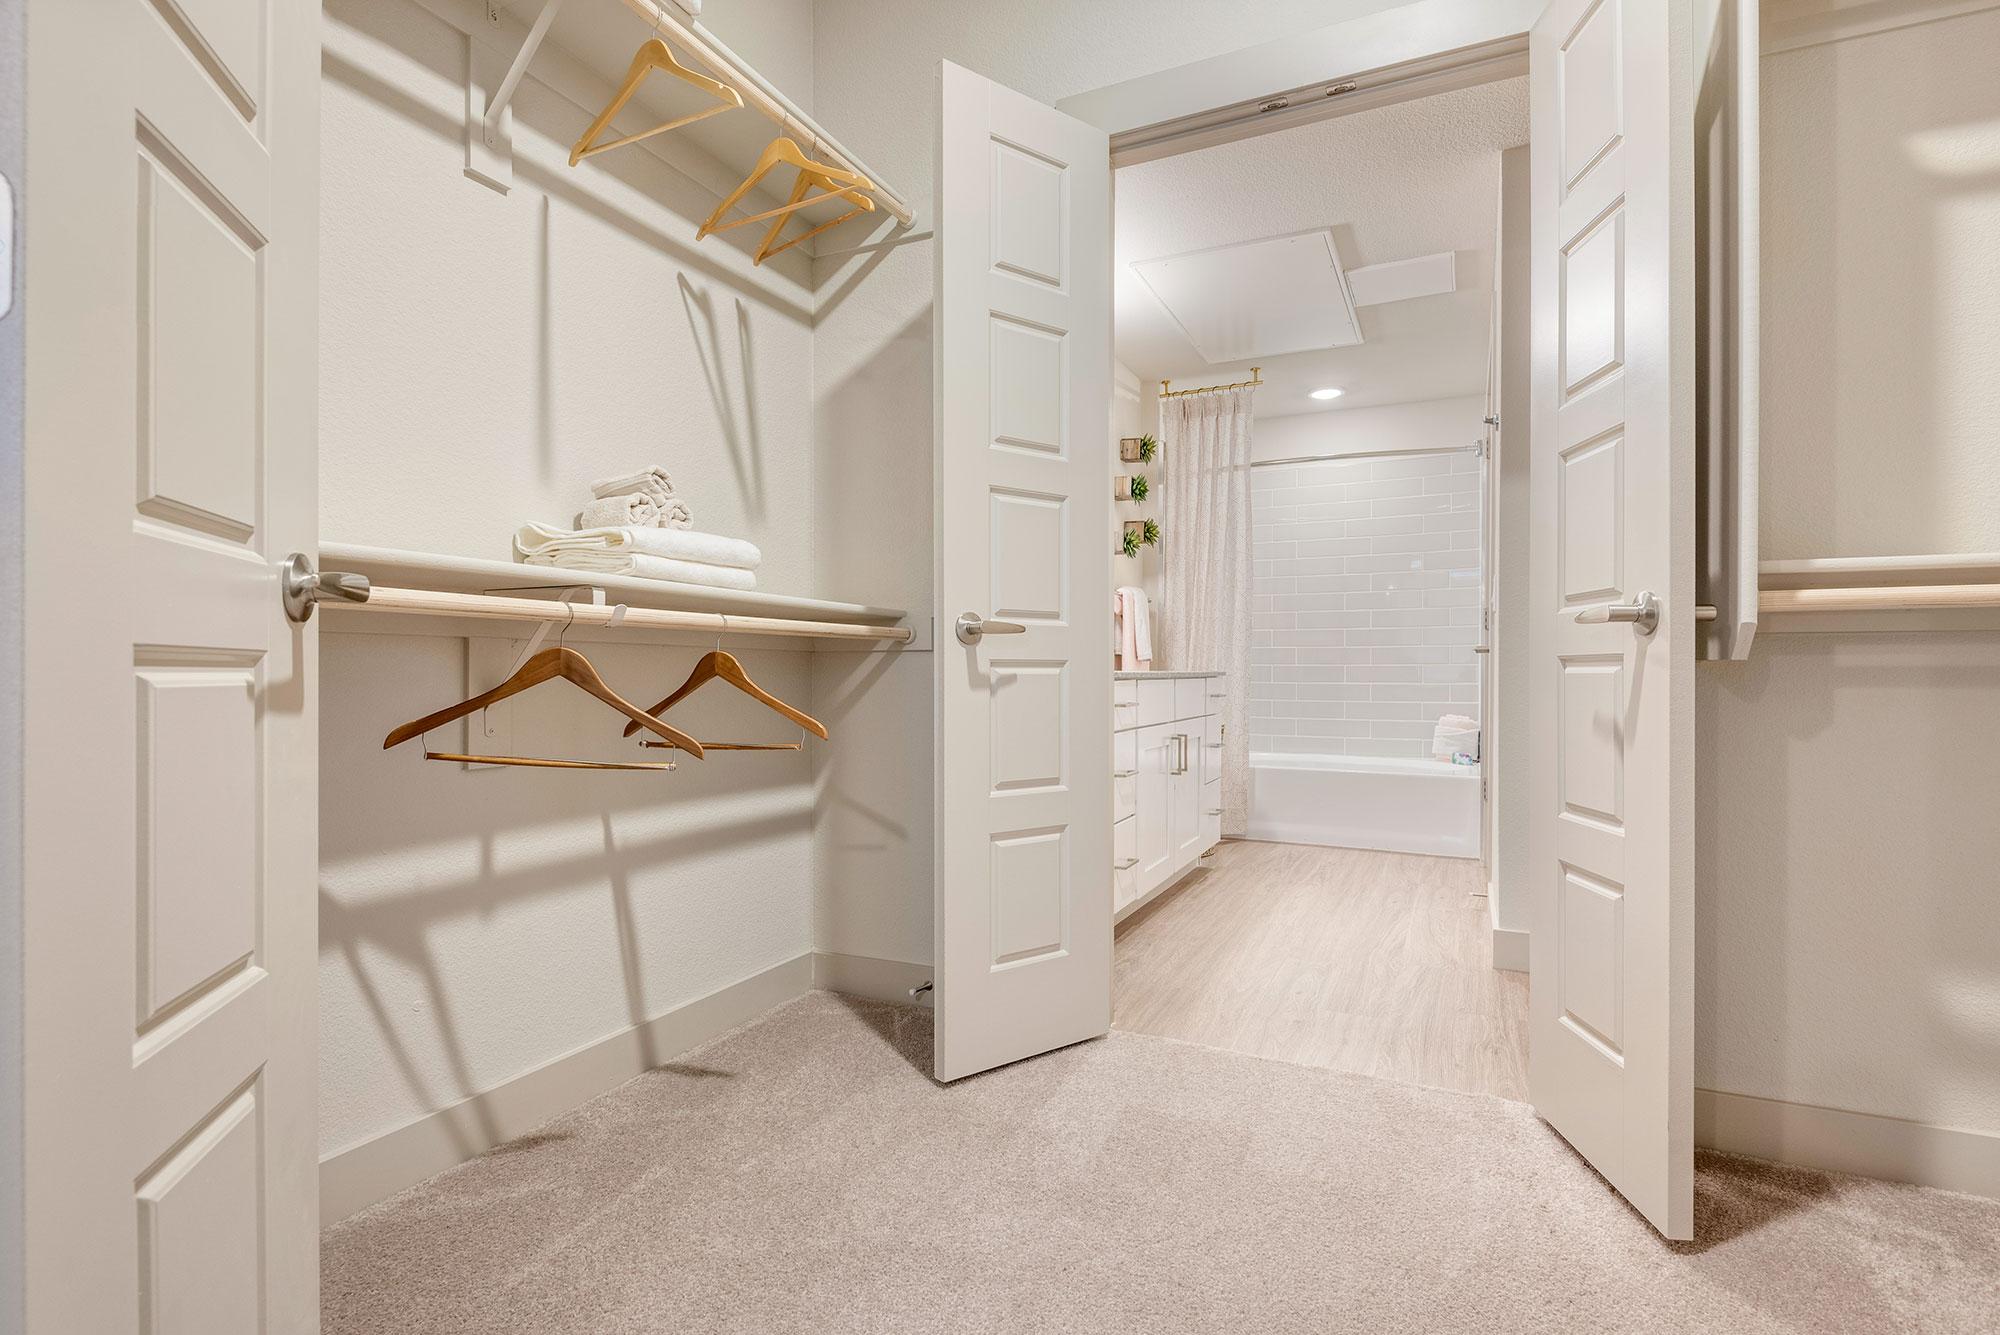 Riata - Model Unit - Closet connecting to bedroom